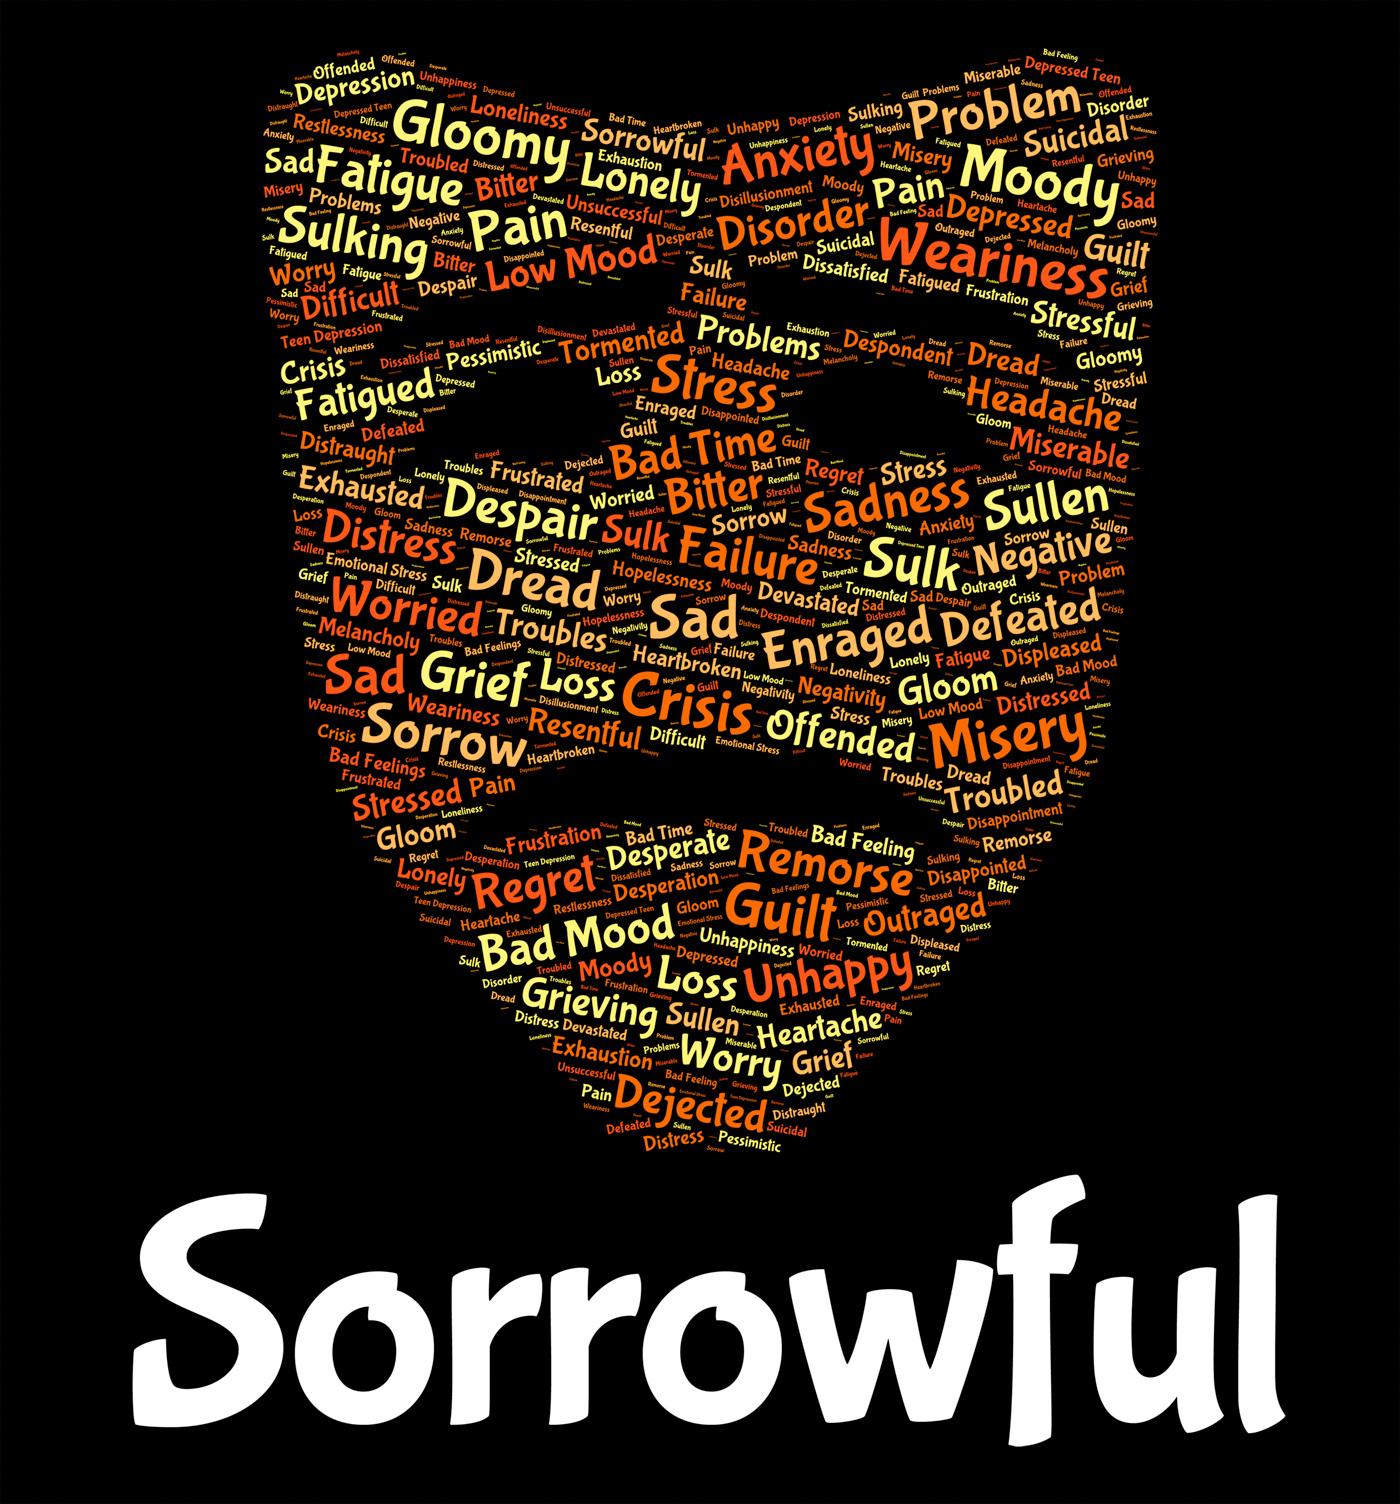 Sorrowful word represents grief stricken and despairing photo